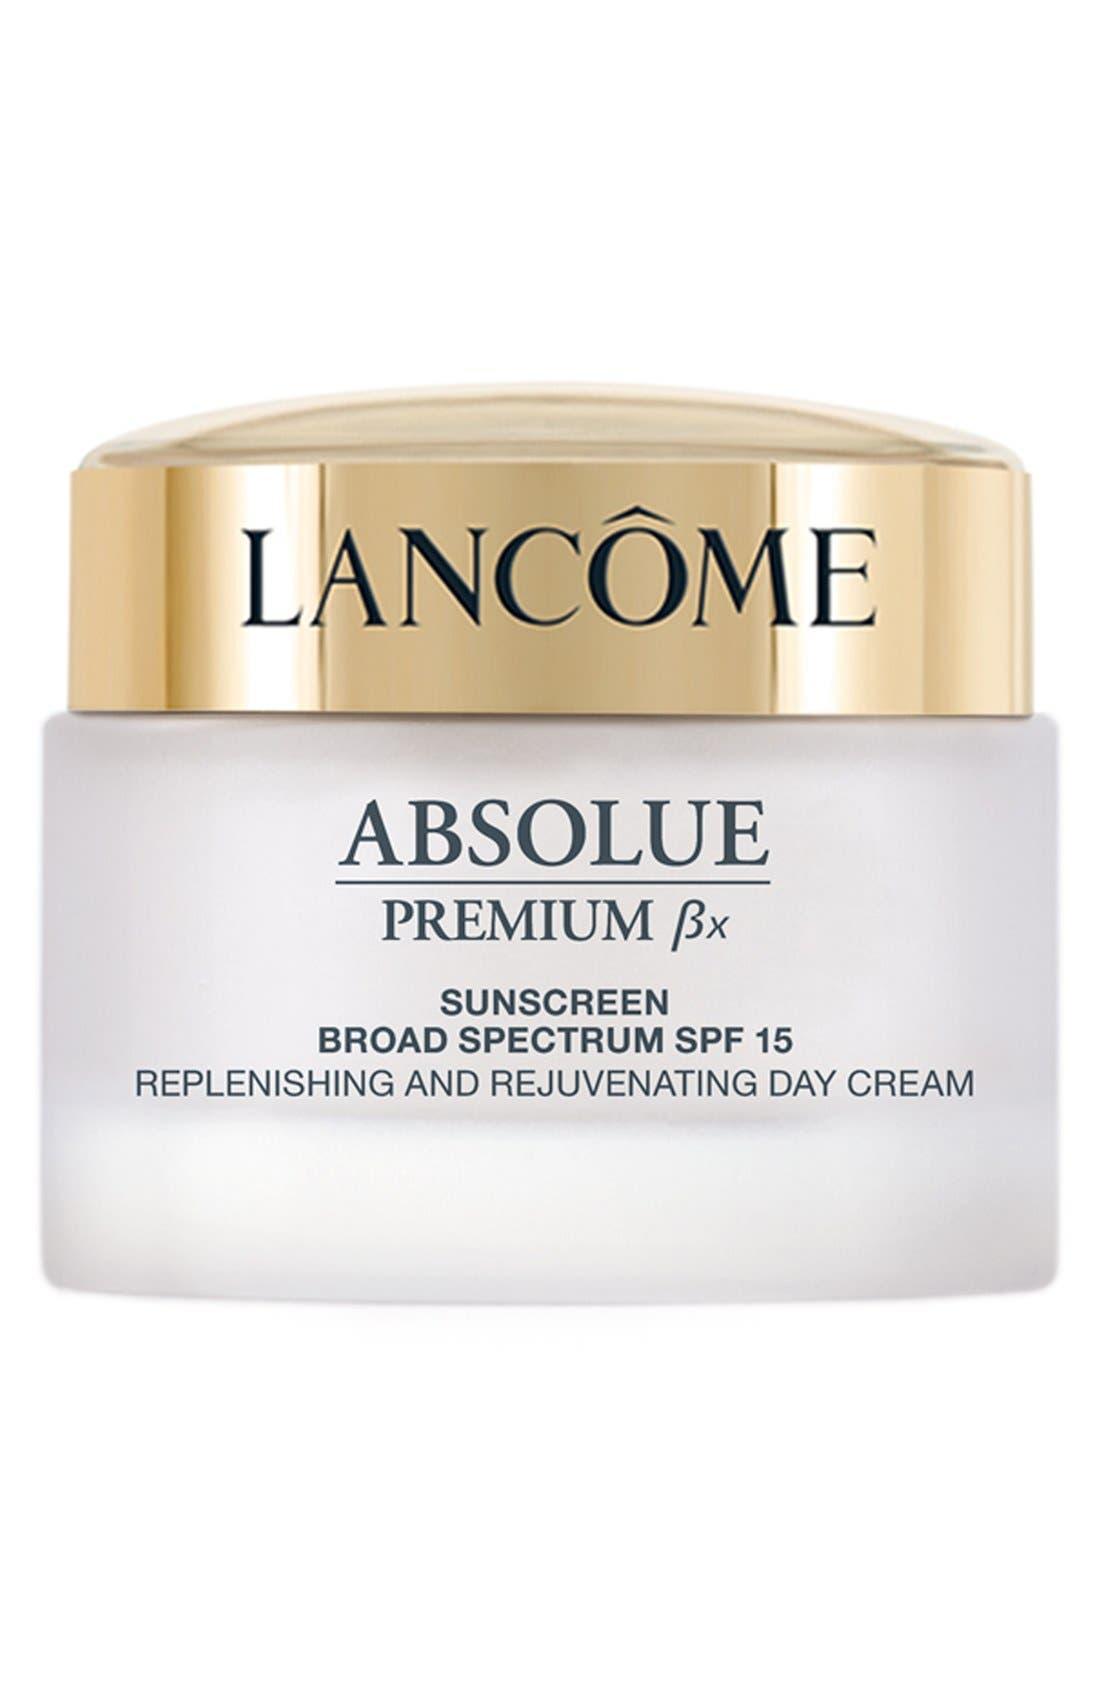 Lancome Absolue Premium Bx Moisturizer With Spf 15